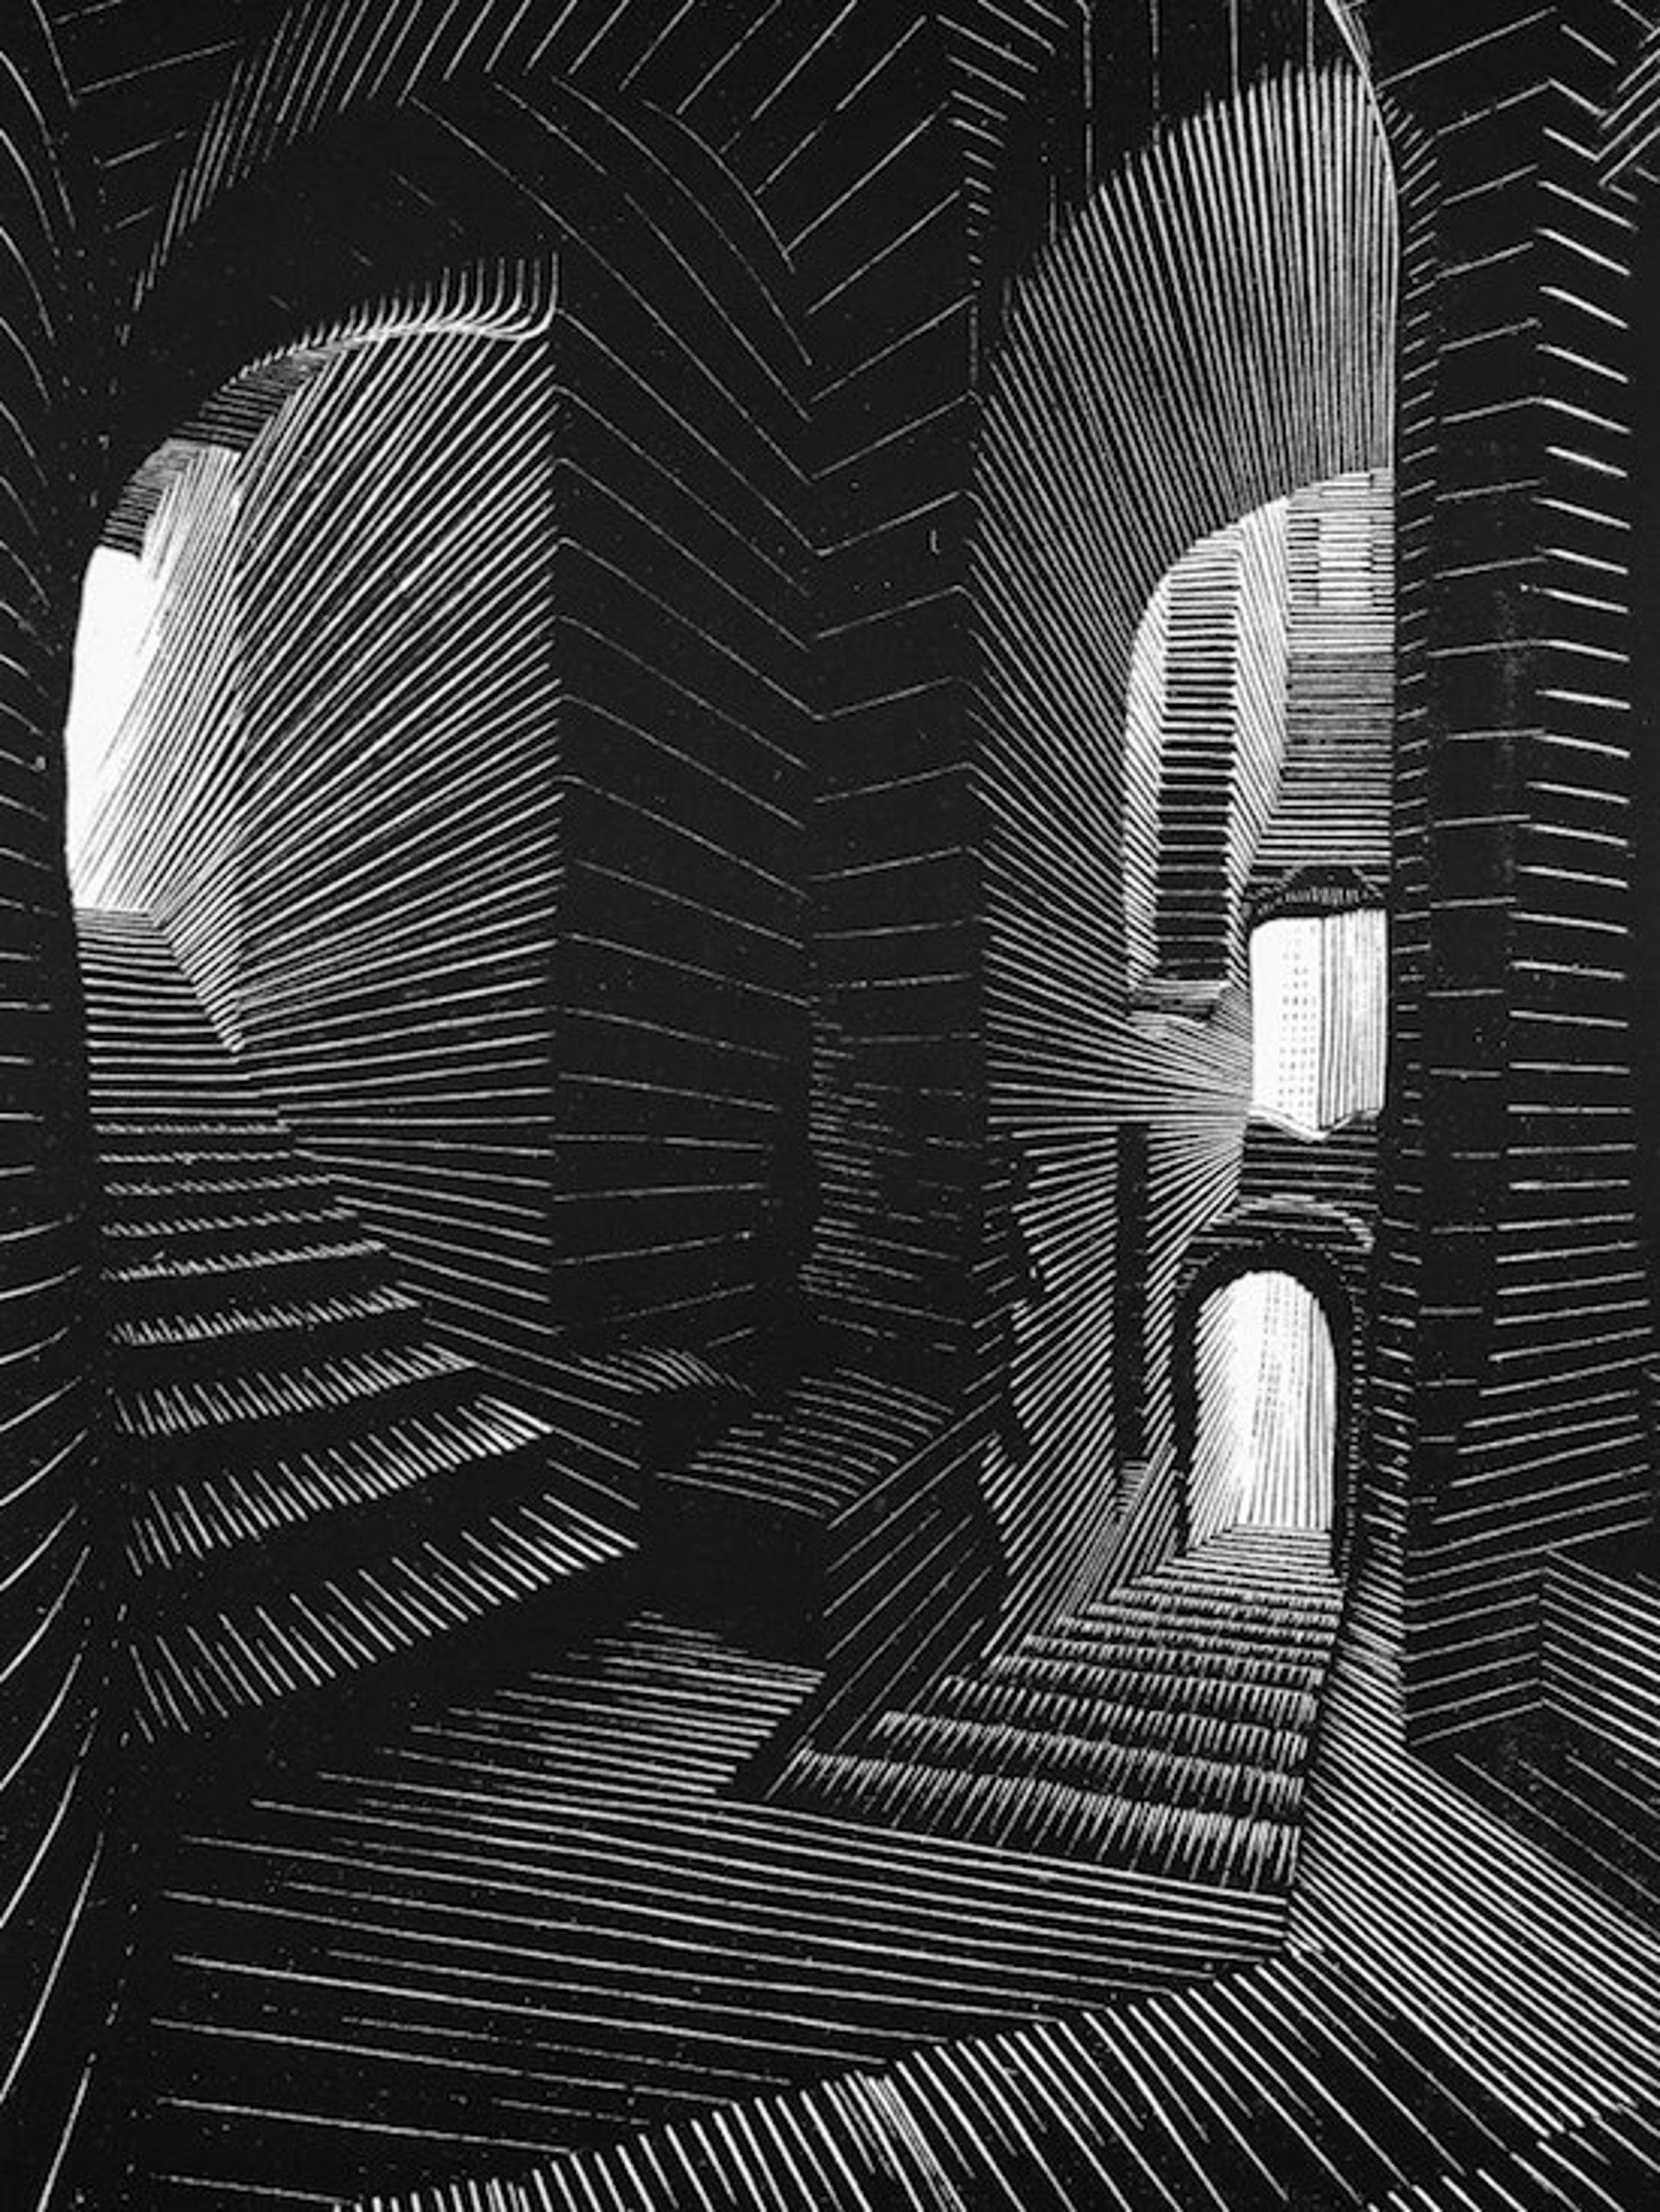 Covered Alley in Atrani, Amalfi by M.C. Escher